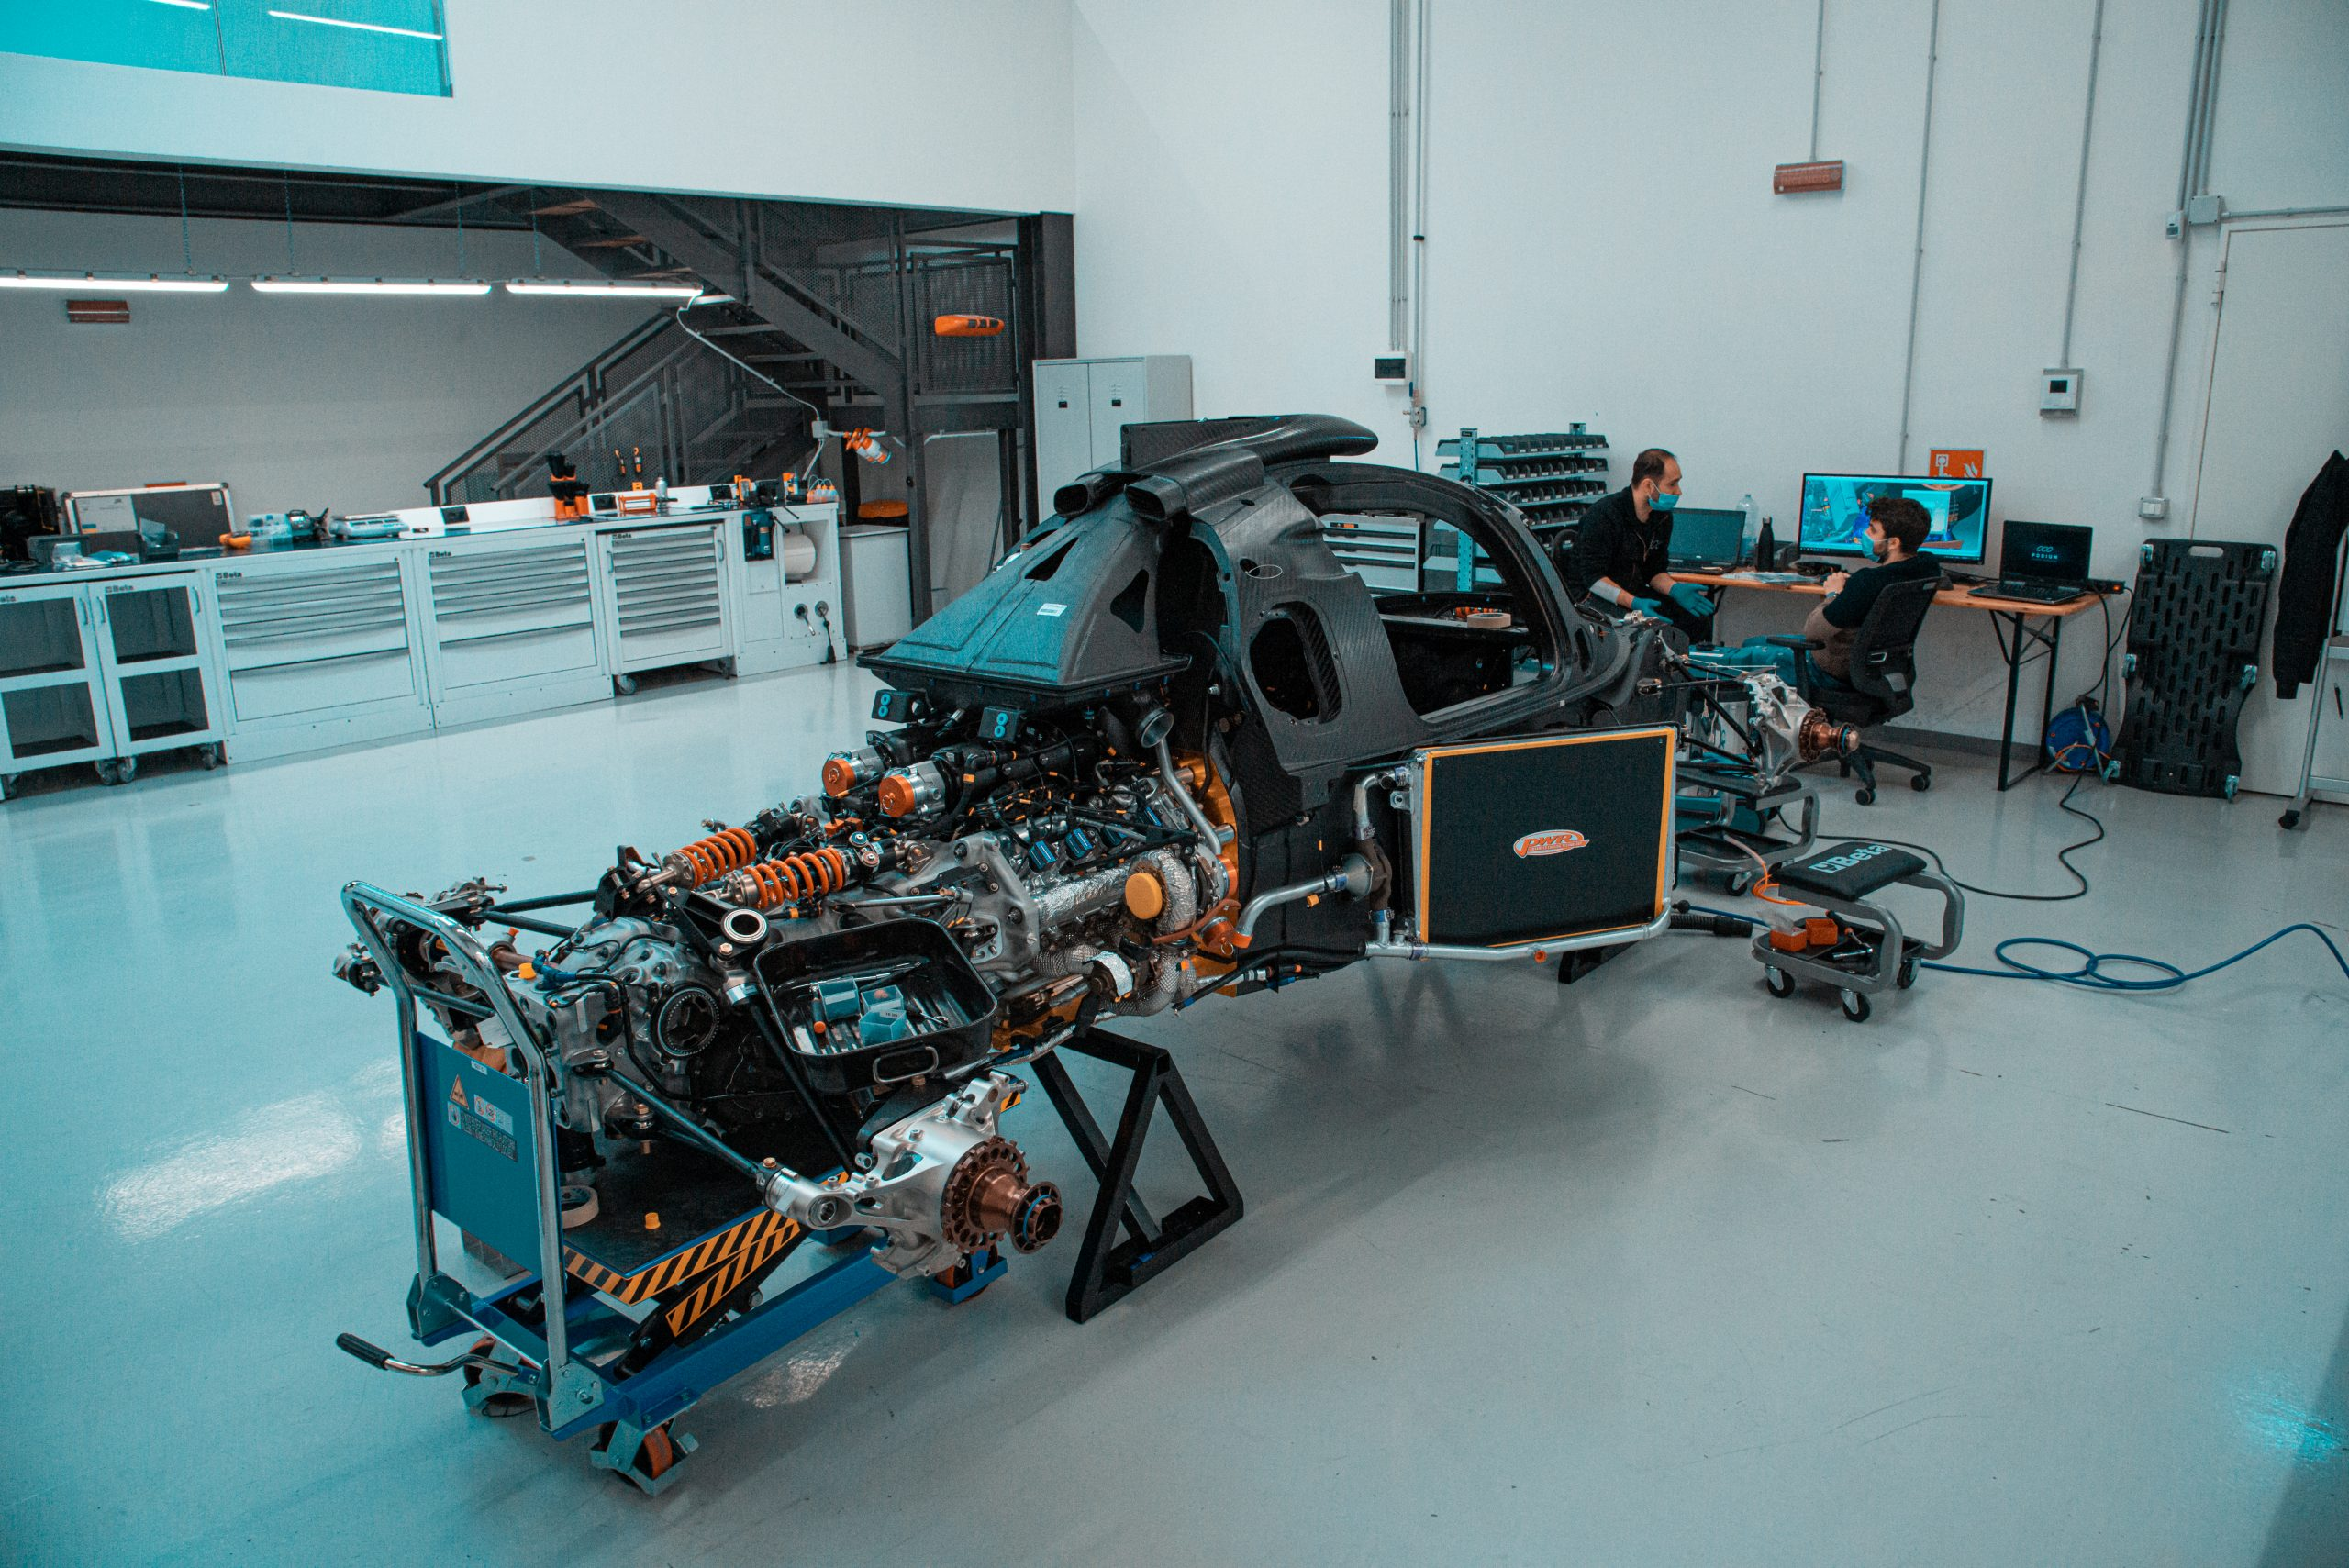 Glickenhaus 007 Hypercar LMH building race shop